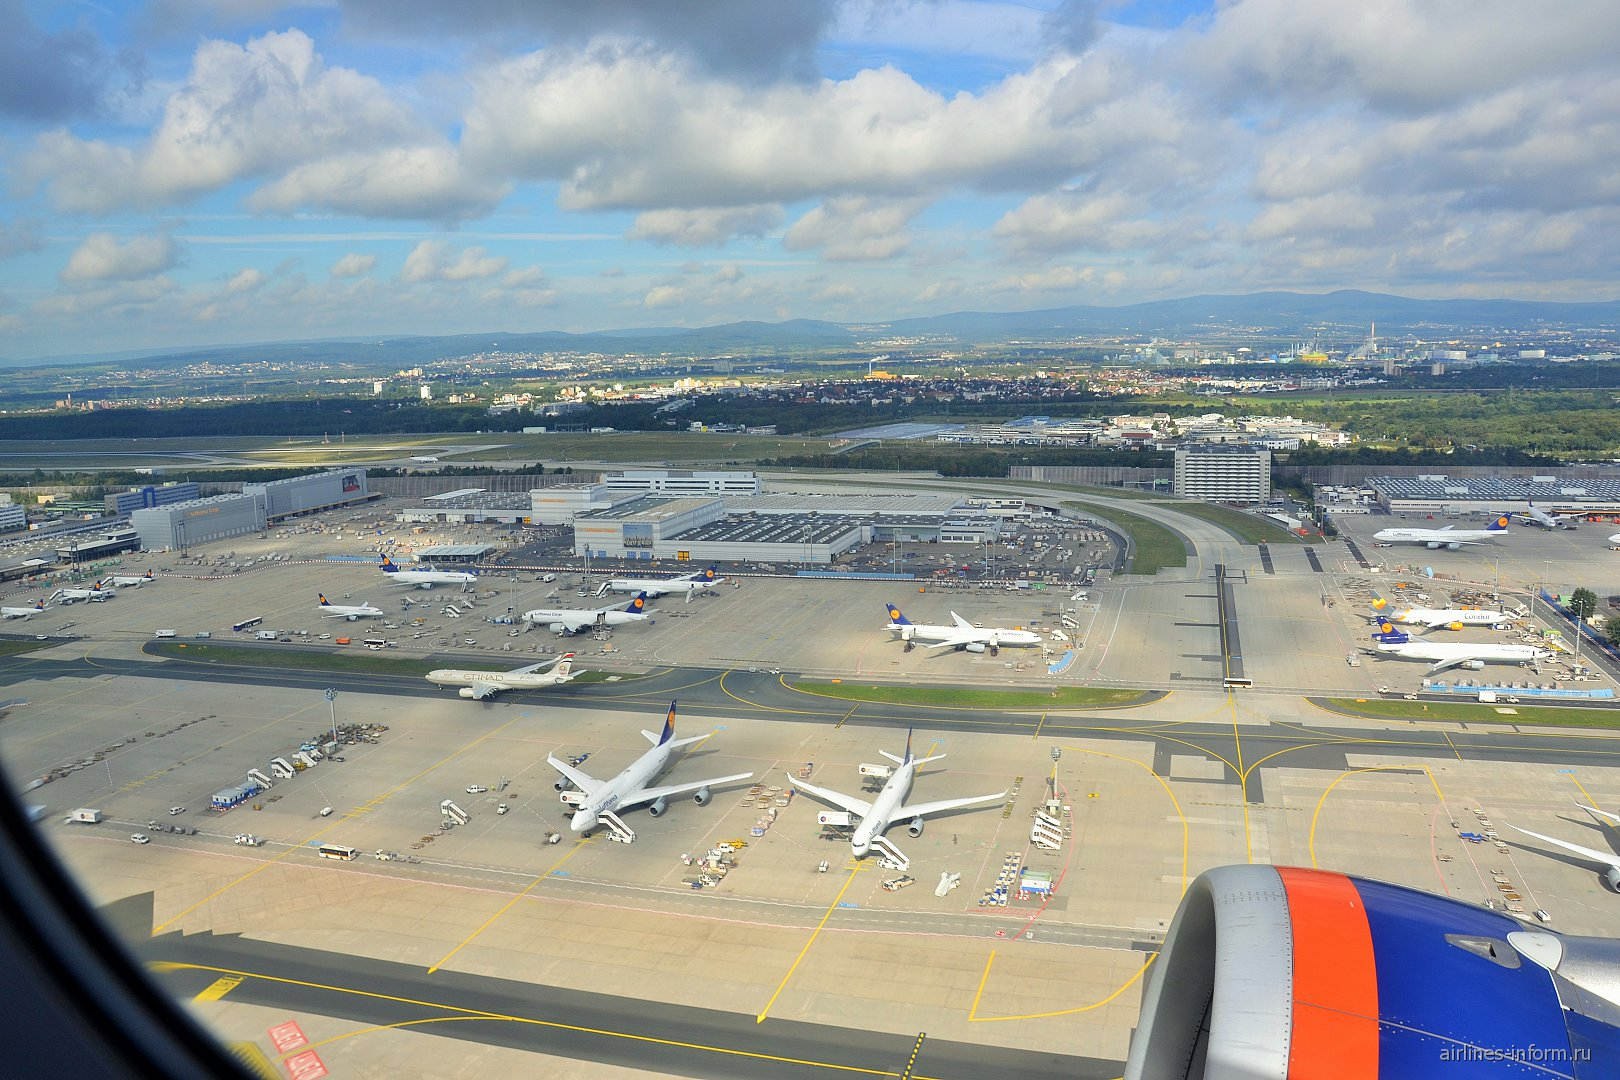 Самолеты на перроне аэропорта Франкфурт